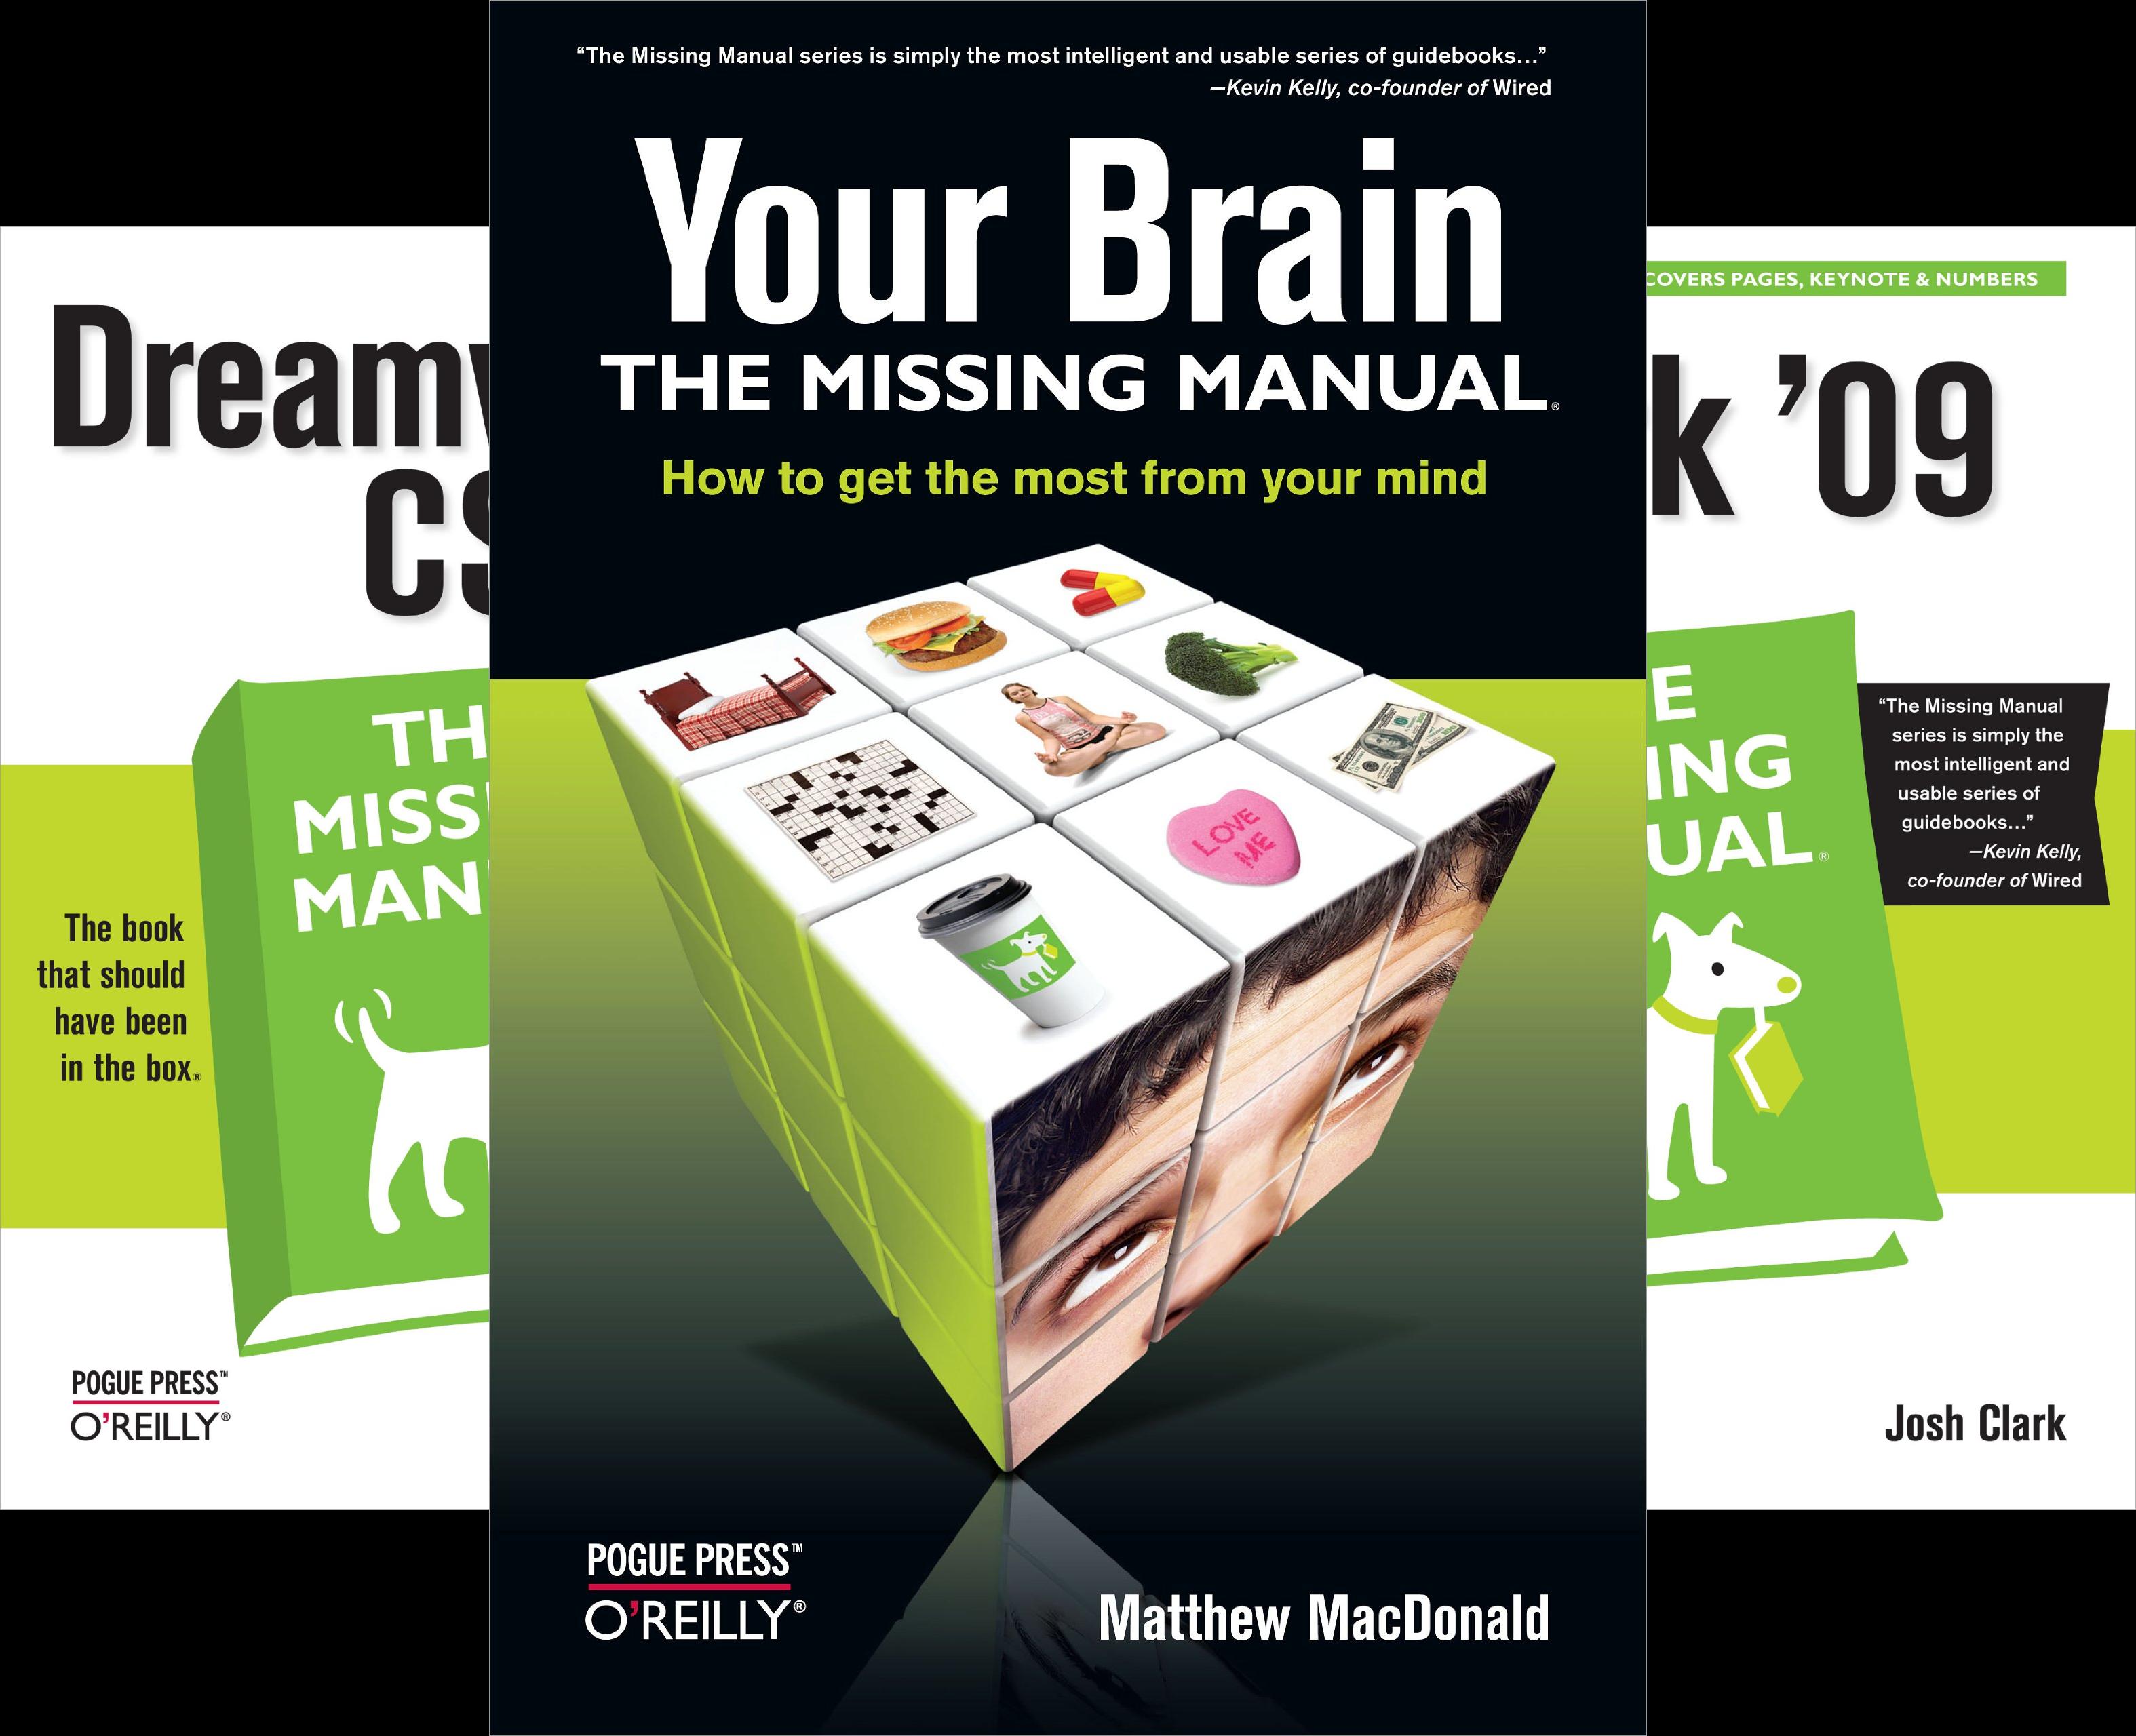 Missing Manuals